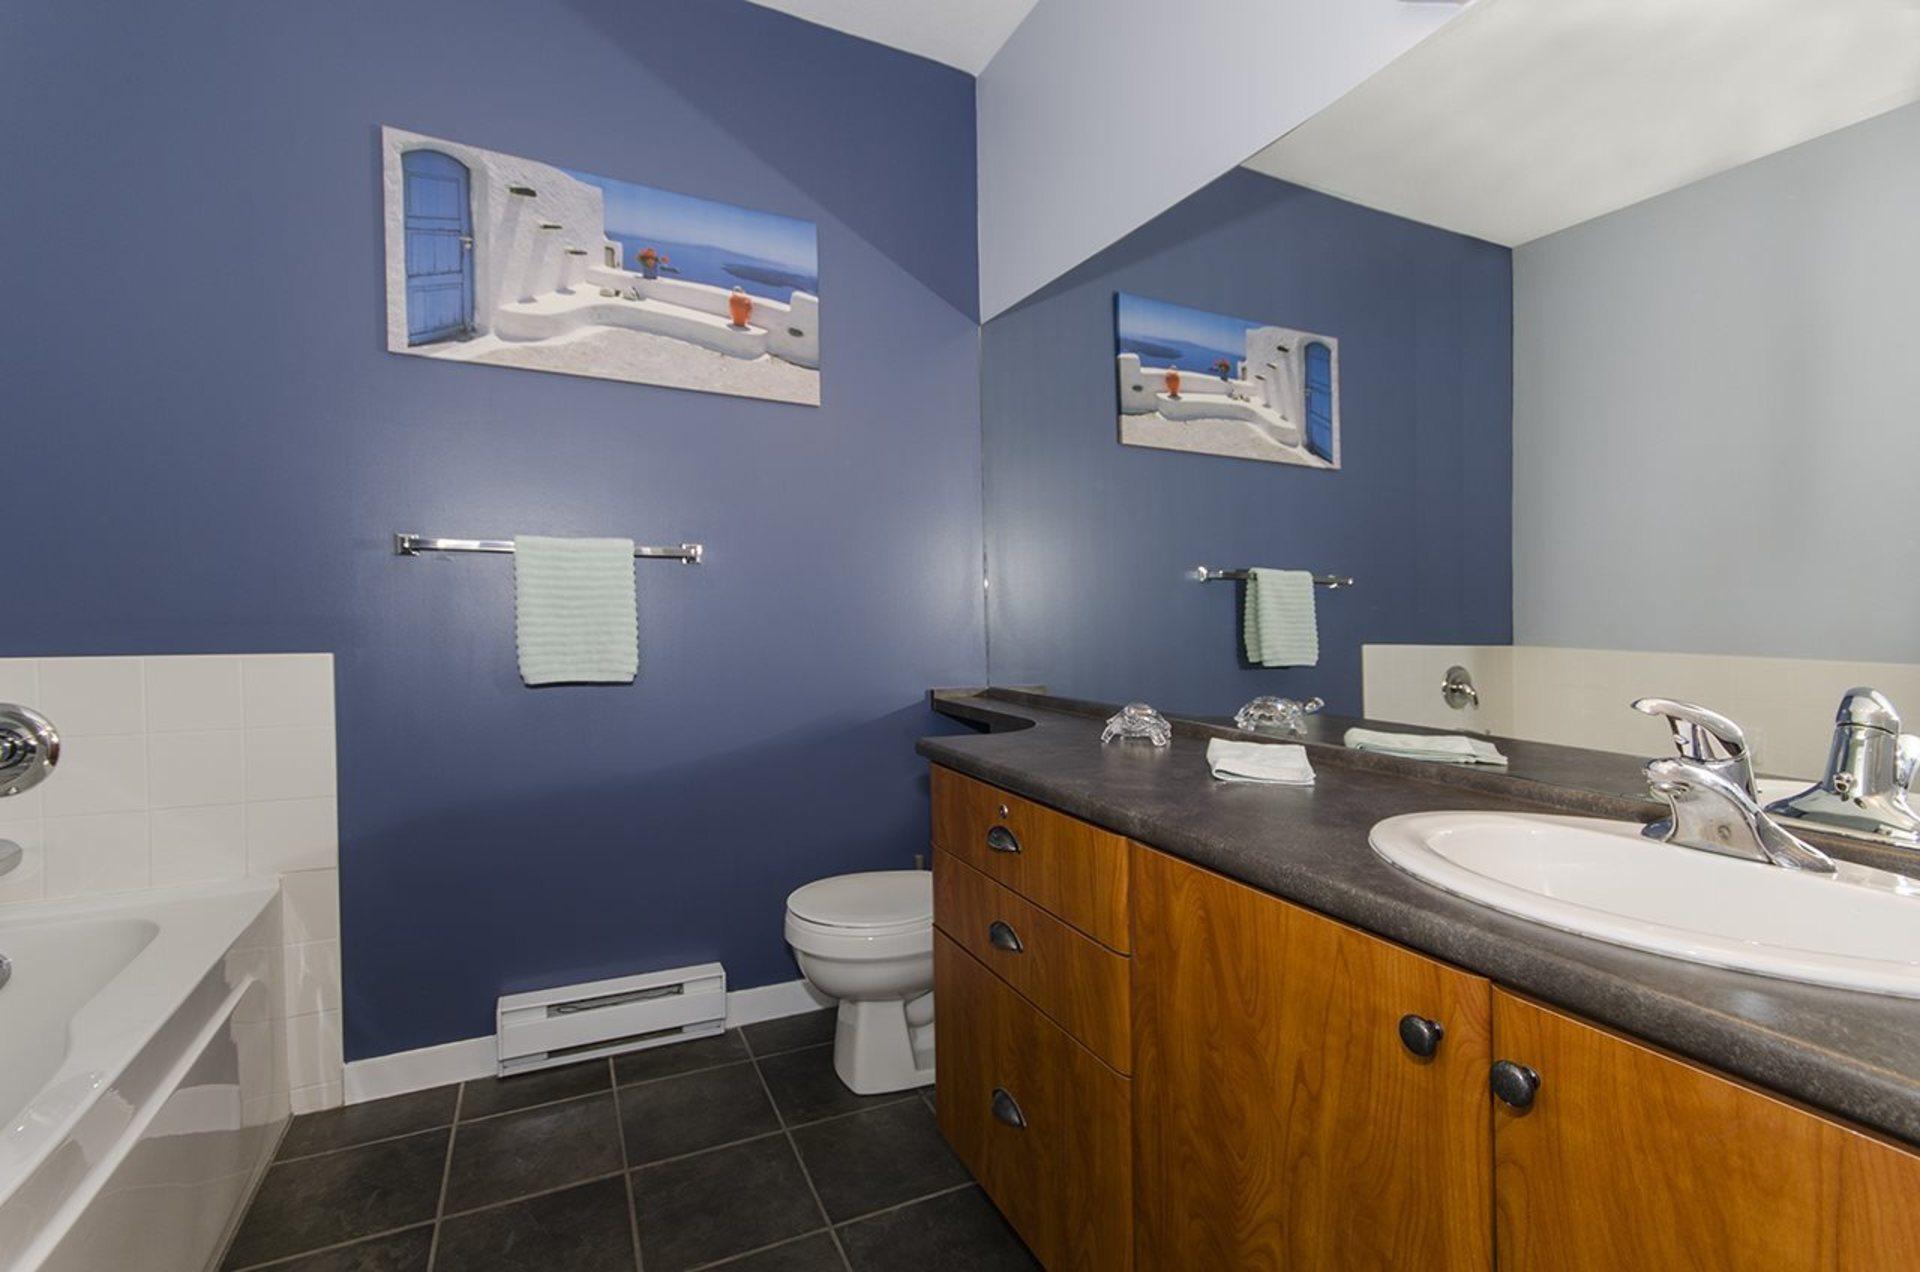 6508-denbigh-avenue-forest-glen-bs-burnaby-south-12 at 318 - 6508 Denbigh Avenue, Forest Glen BS, Burnaby South